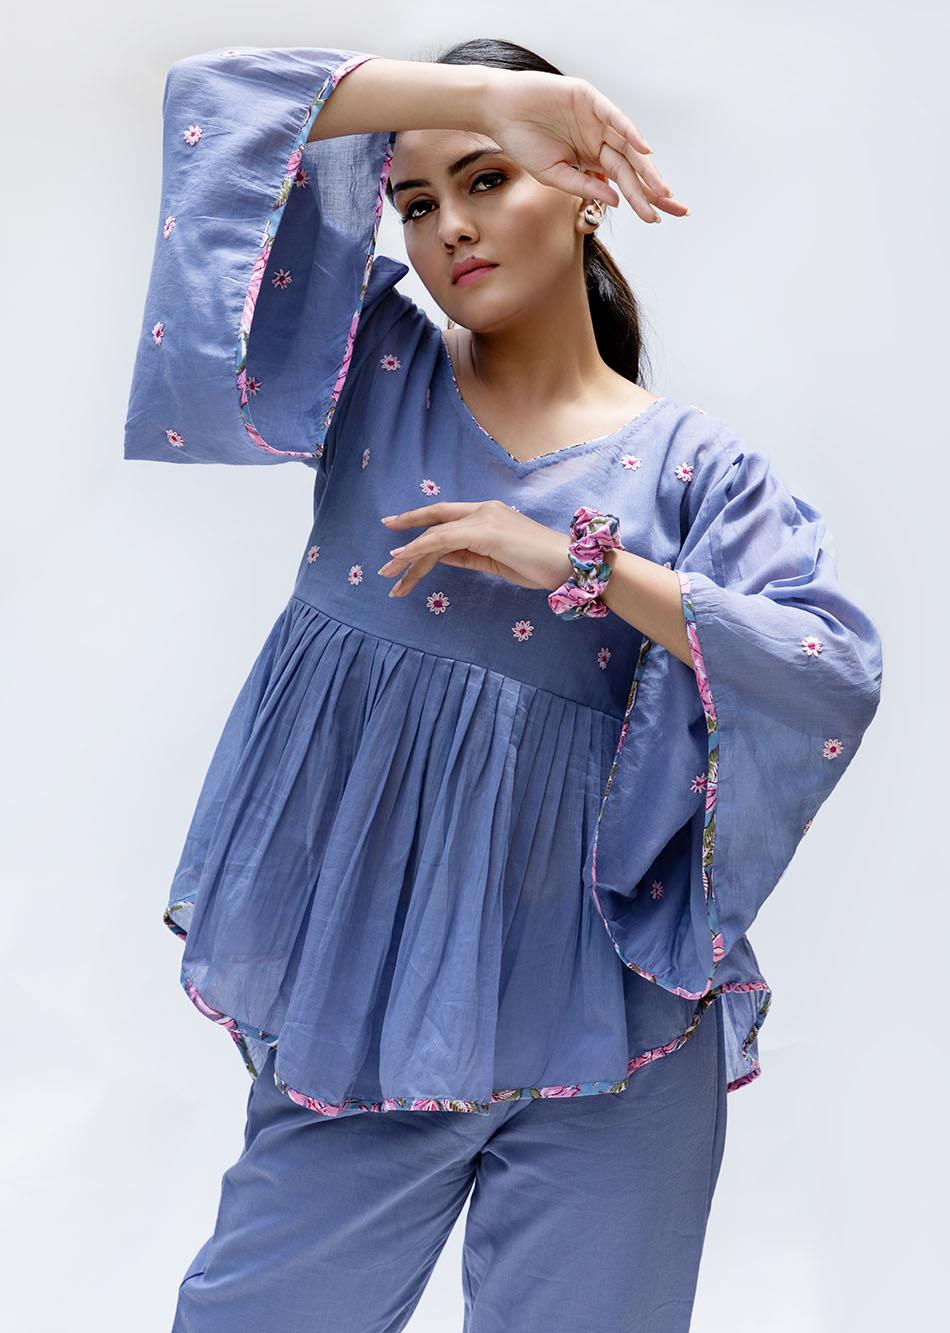 Baiguni Loose pleated top By Jovi Fashion